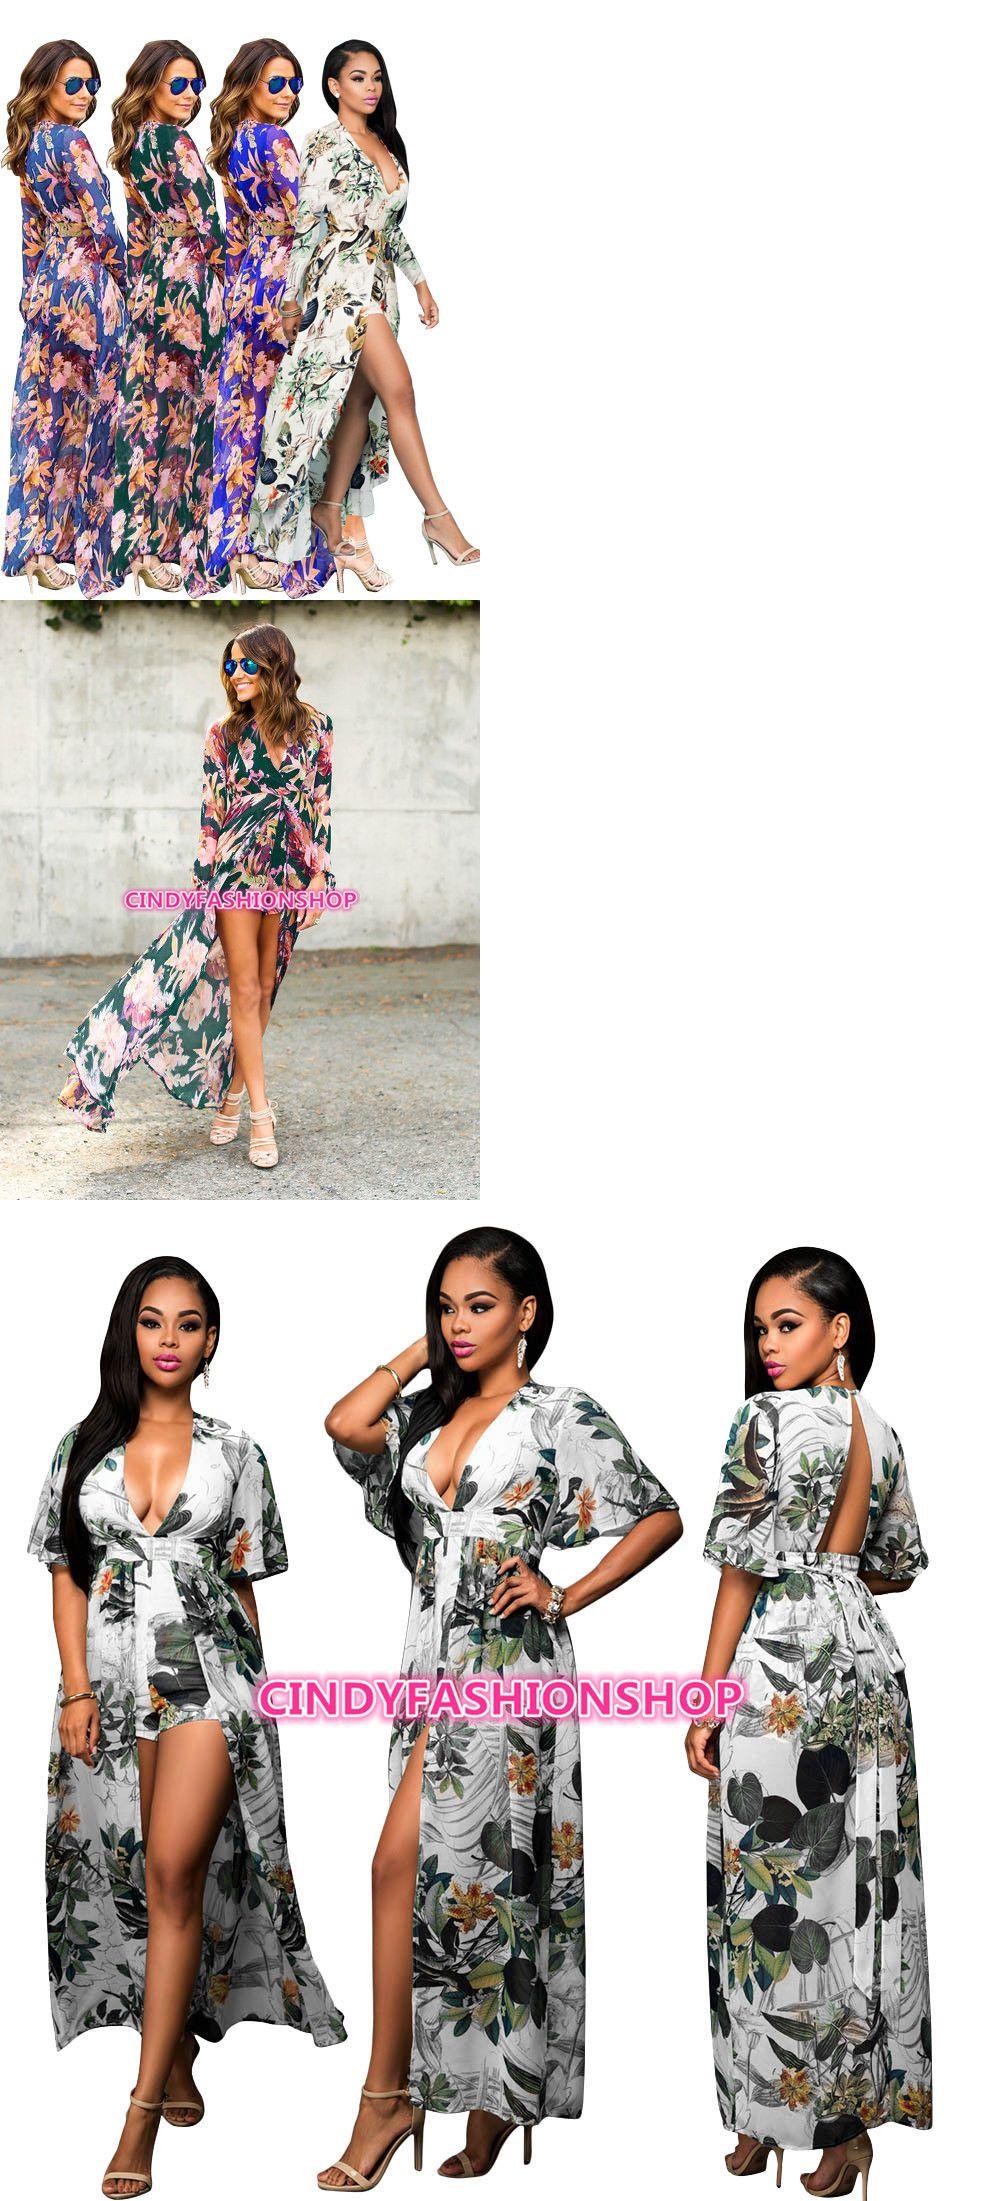 46dac6d3a96 Dresses 175784  Usa Women Long Sleeve Maxi Summer Floral Short Romper Dress  Bo Ho Split Chiffon -  BUY IT NOW ONLY   25.88 on  eBay  dresses  women   sleeve ...